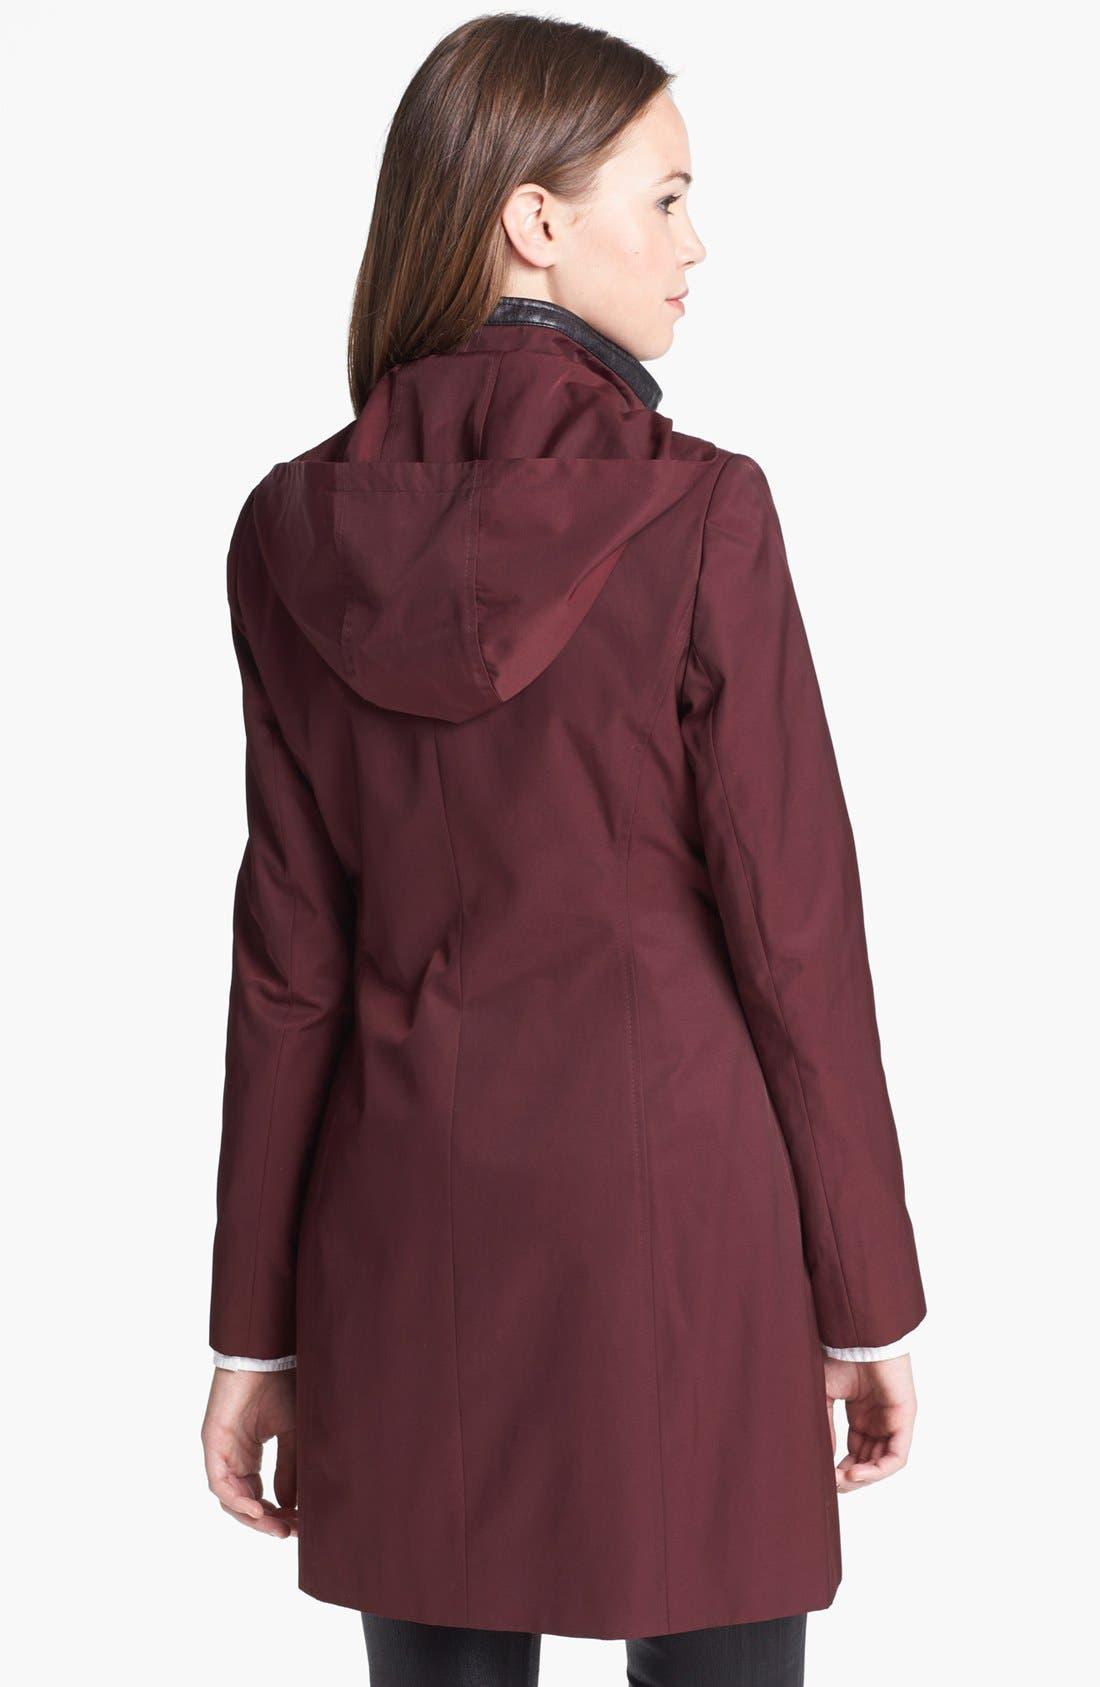 Alternate Image 2  - Via Spiga Asymmetrical Faux Leather Trim Raincoat (Online Only)